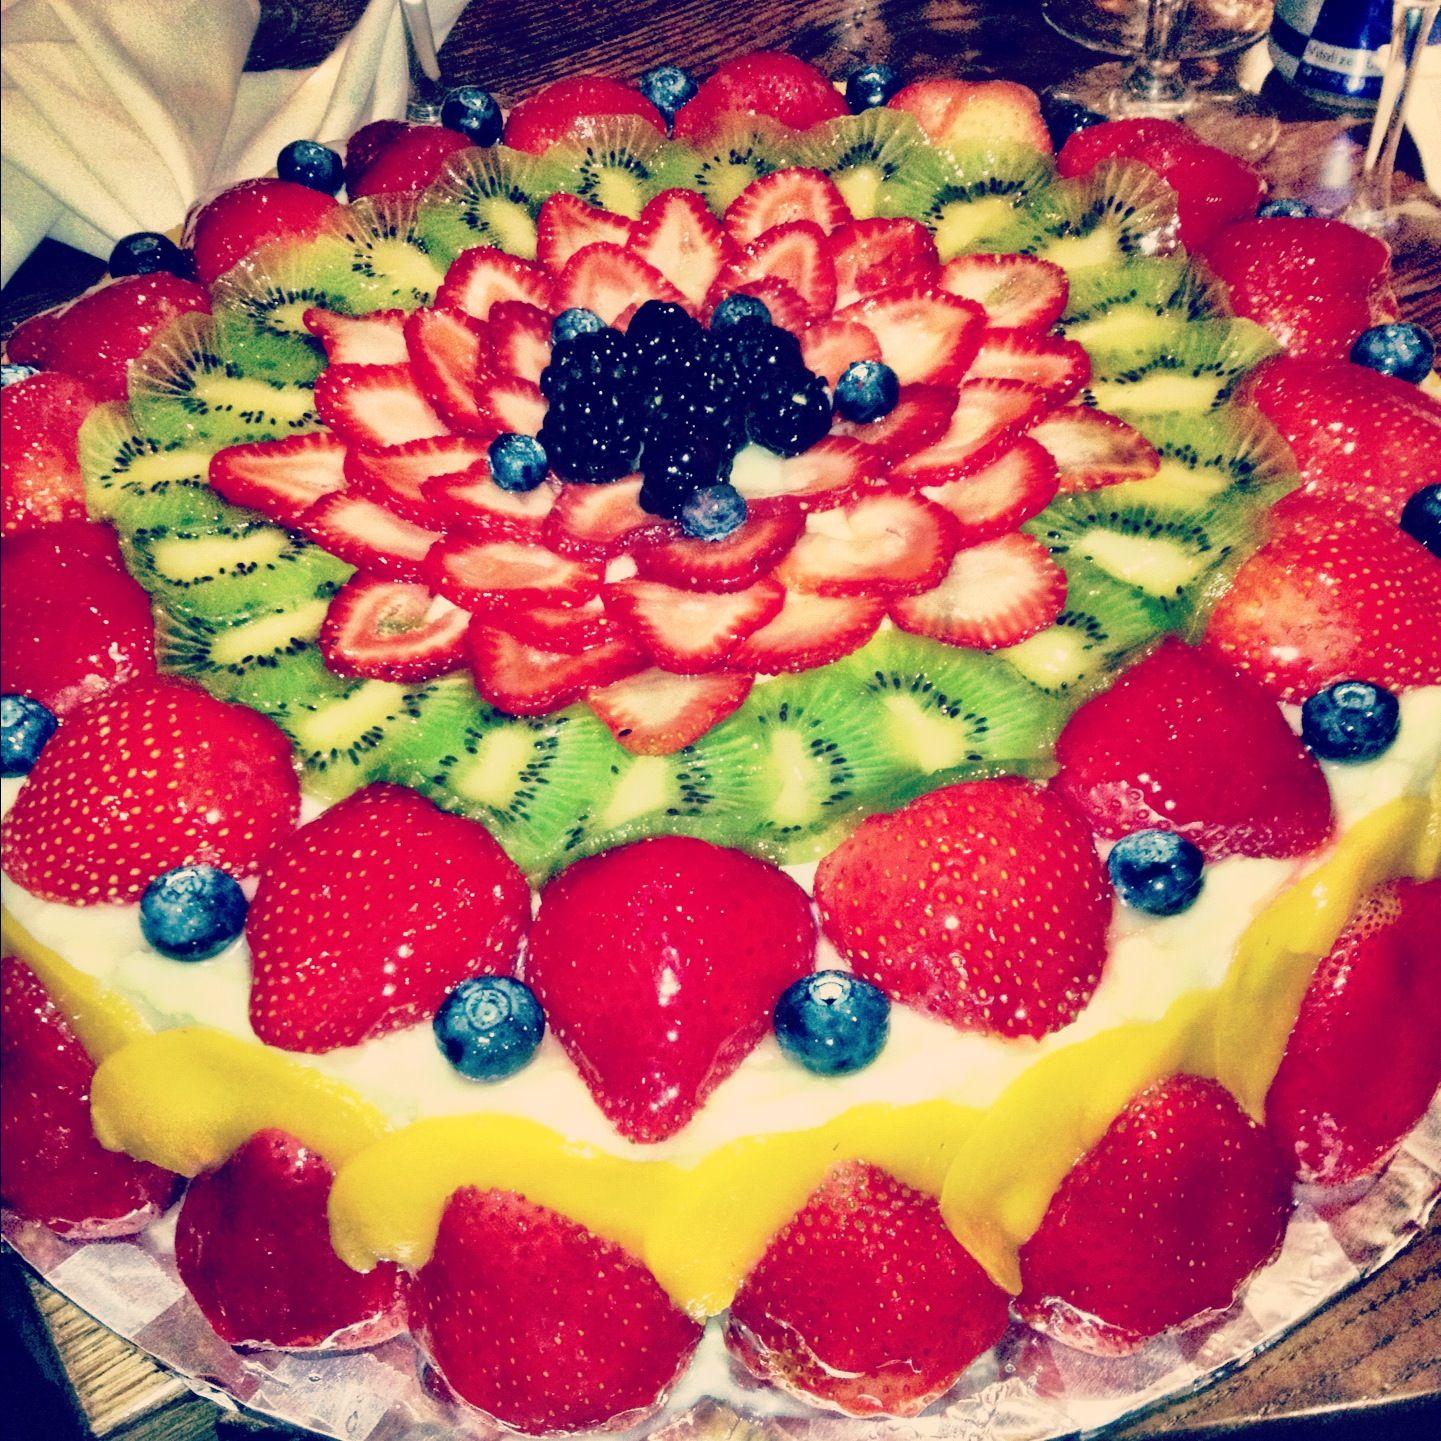 Best Birthday Cake Ever!